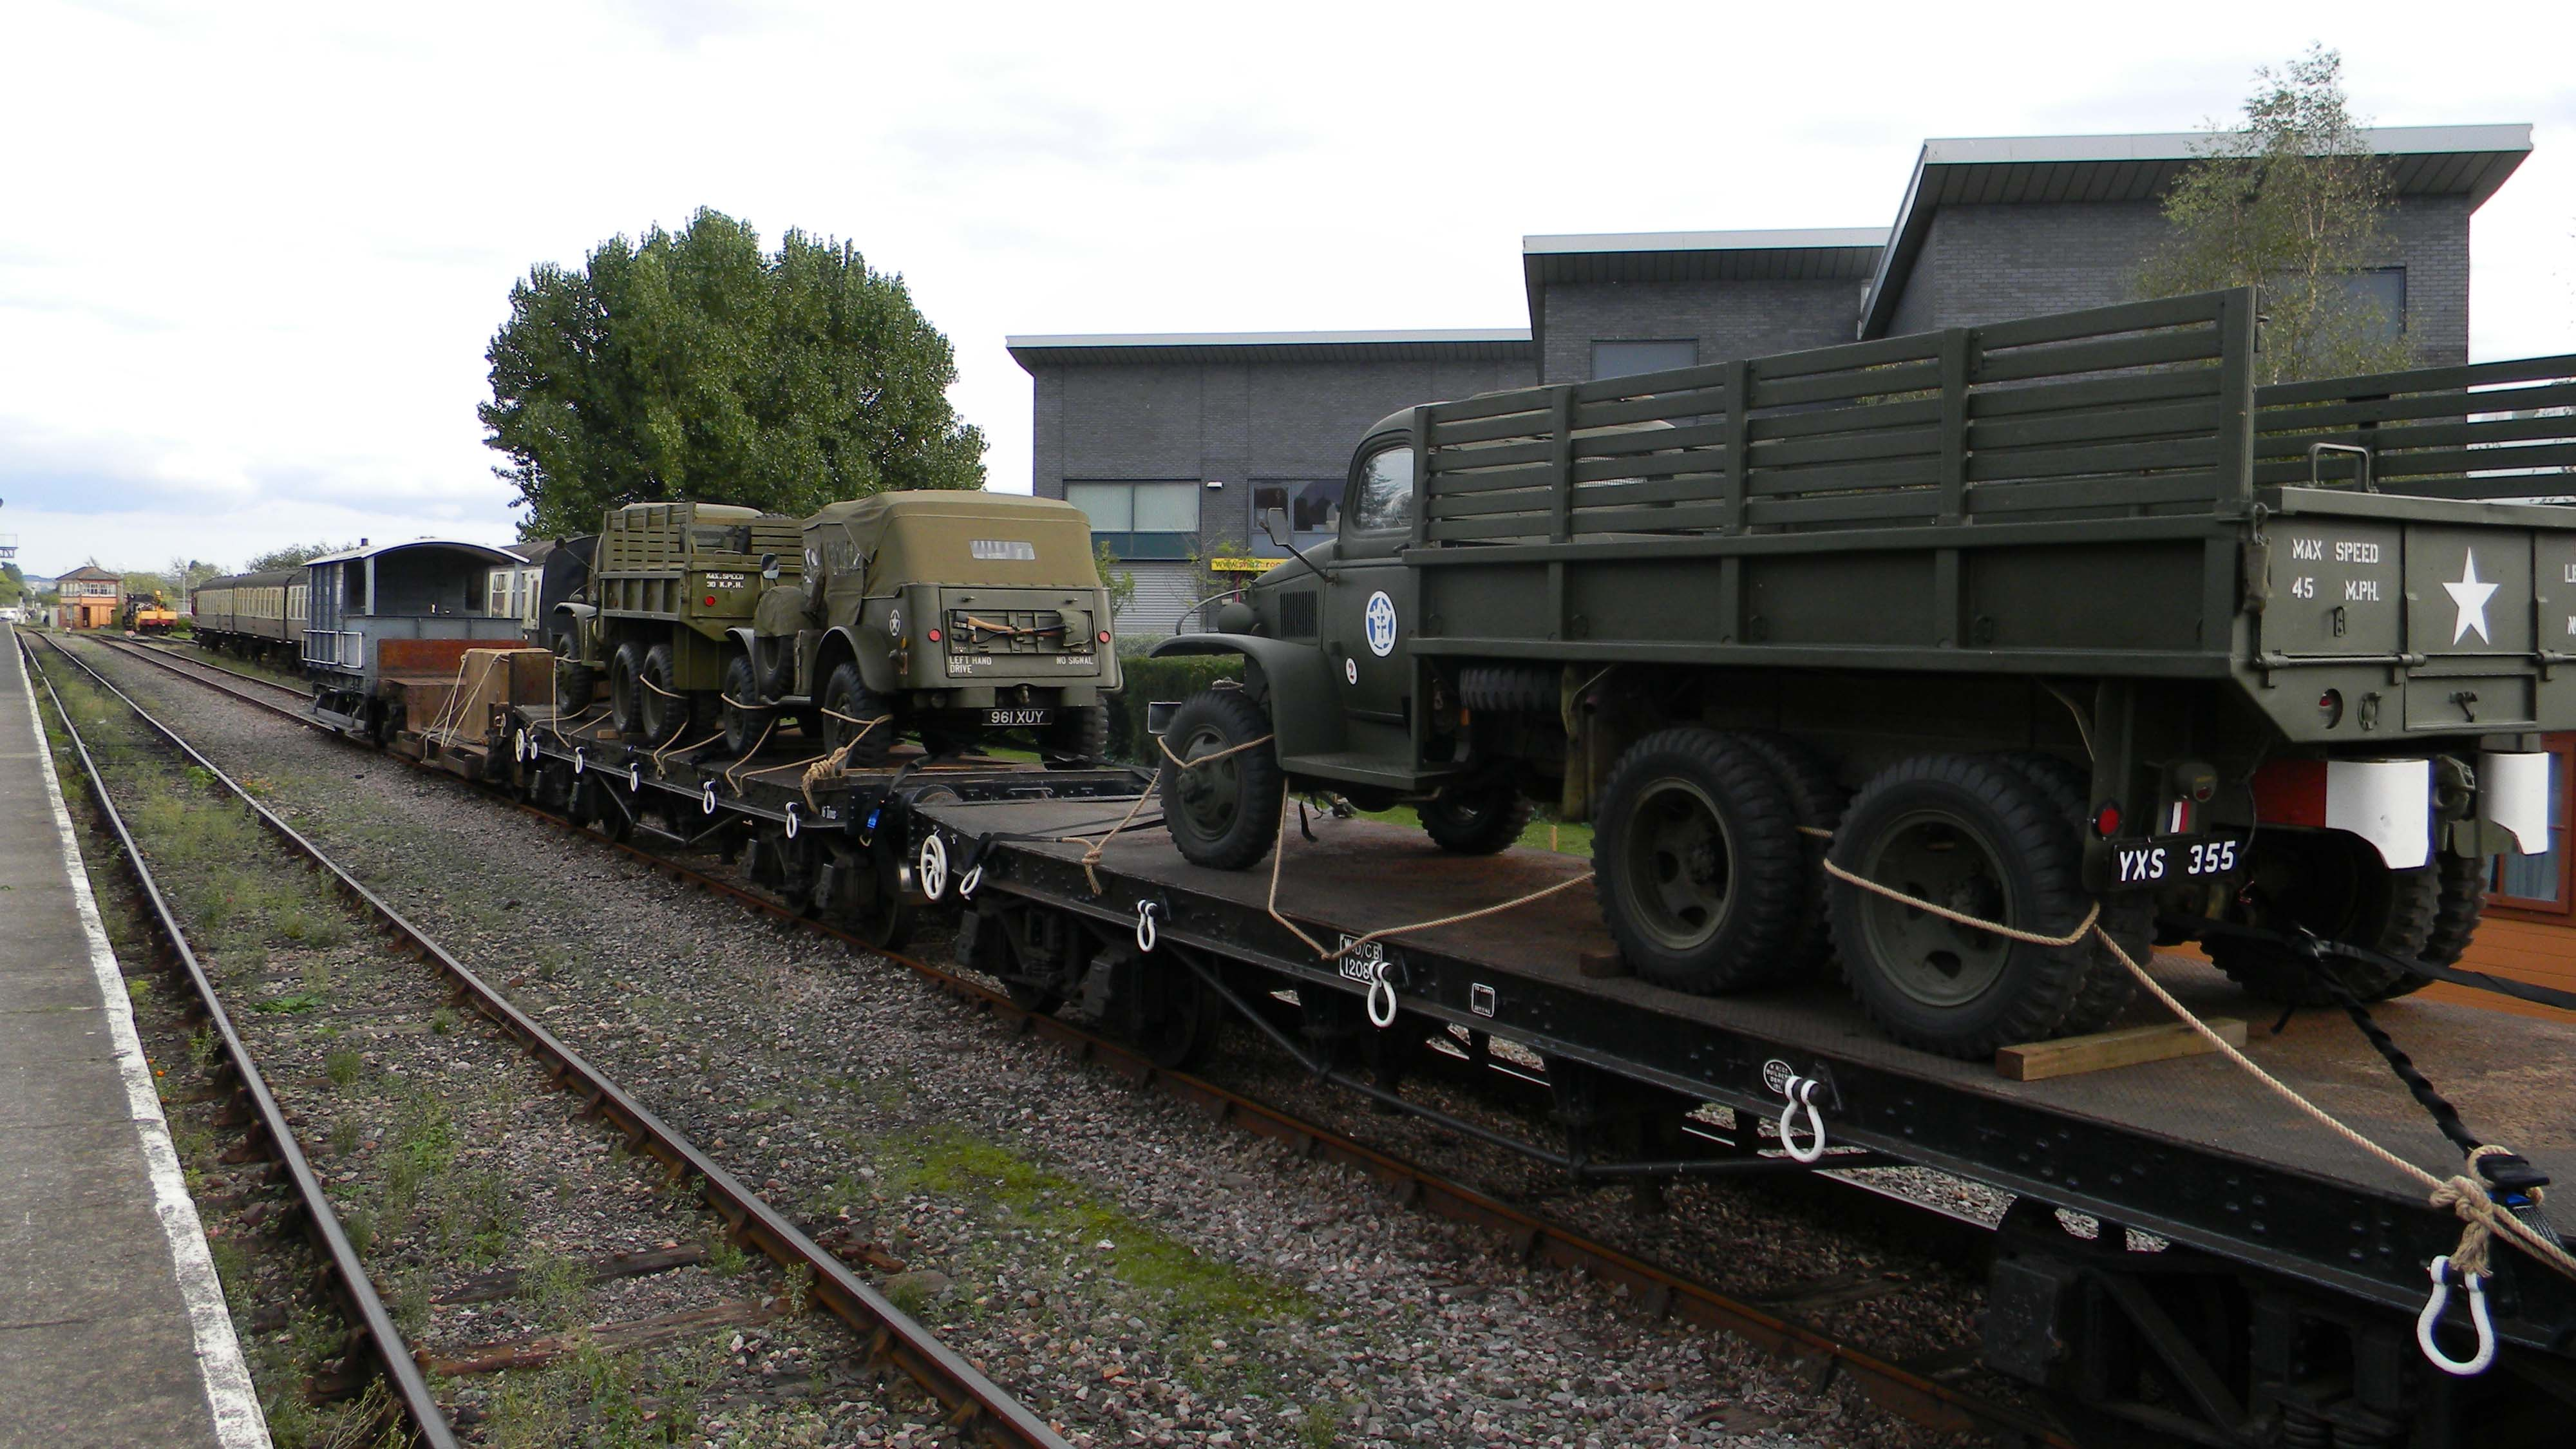 1940s-Freight-Train-Minehead-Karen-Rogers